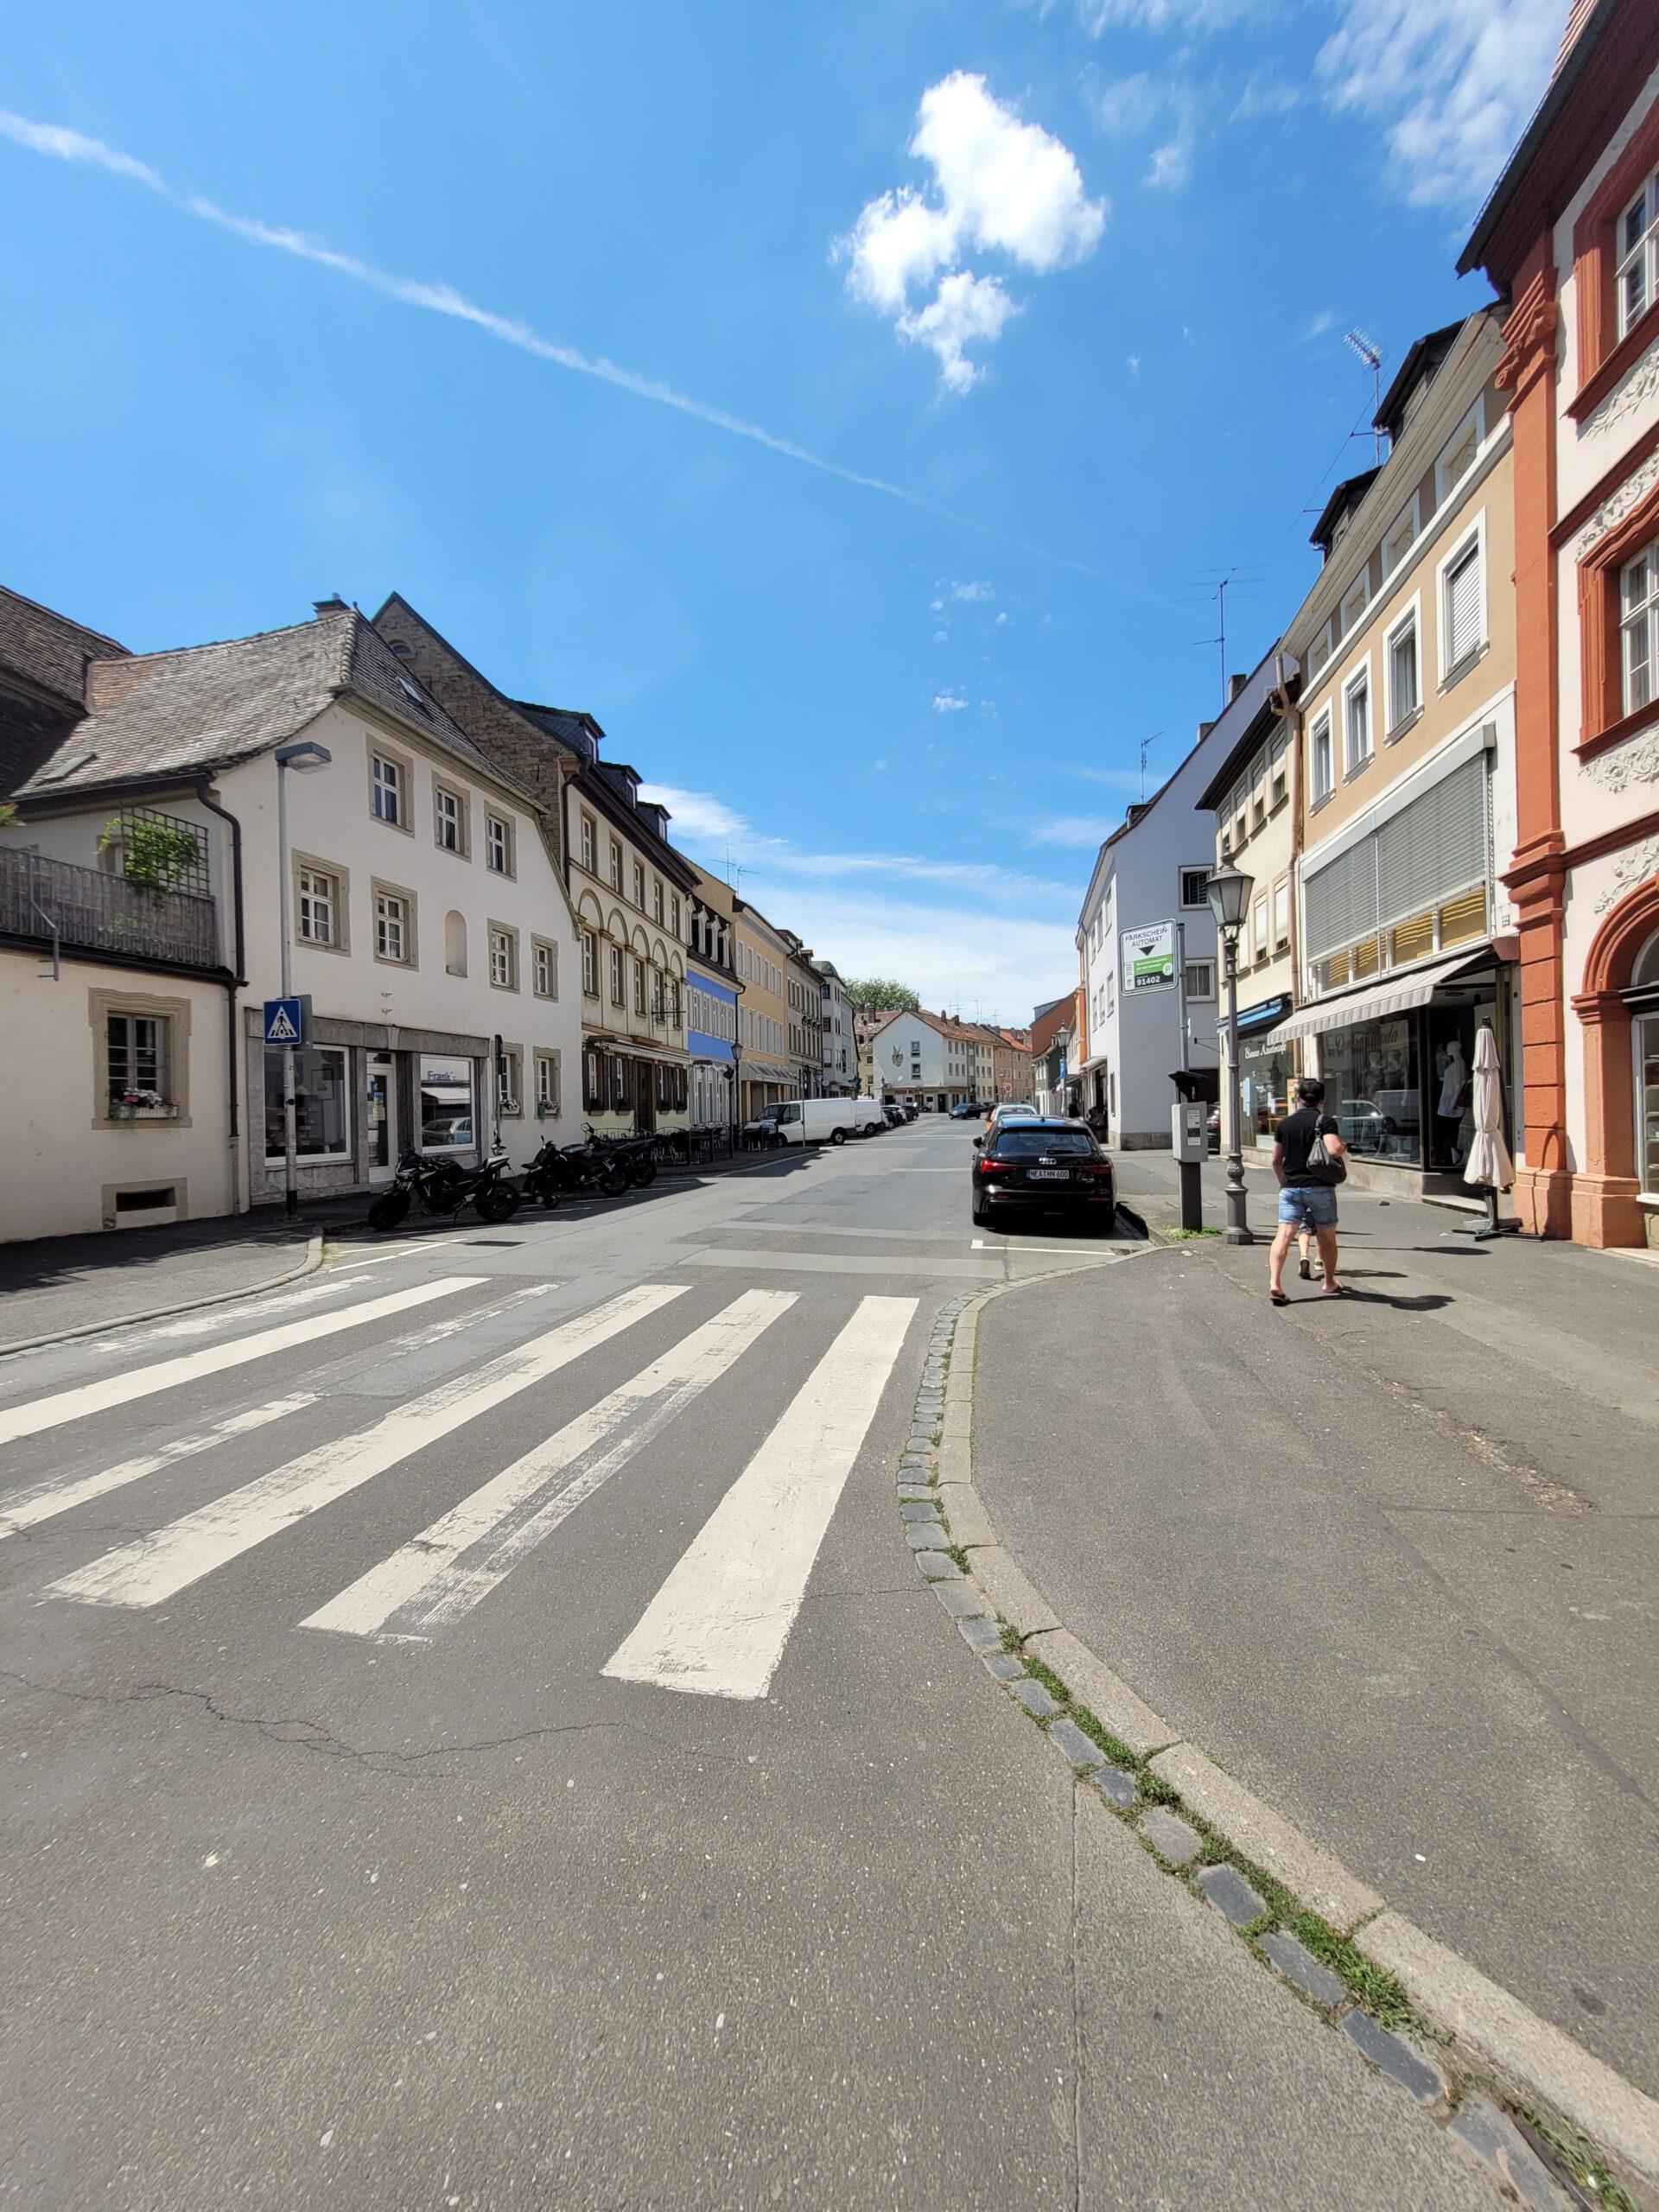 Klimaresilienz: Kitzingen begrünen